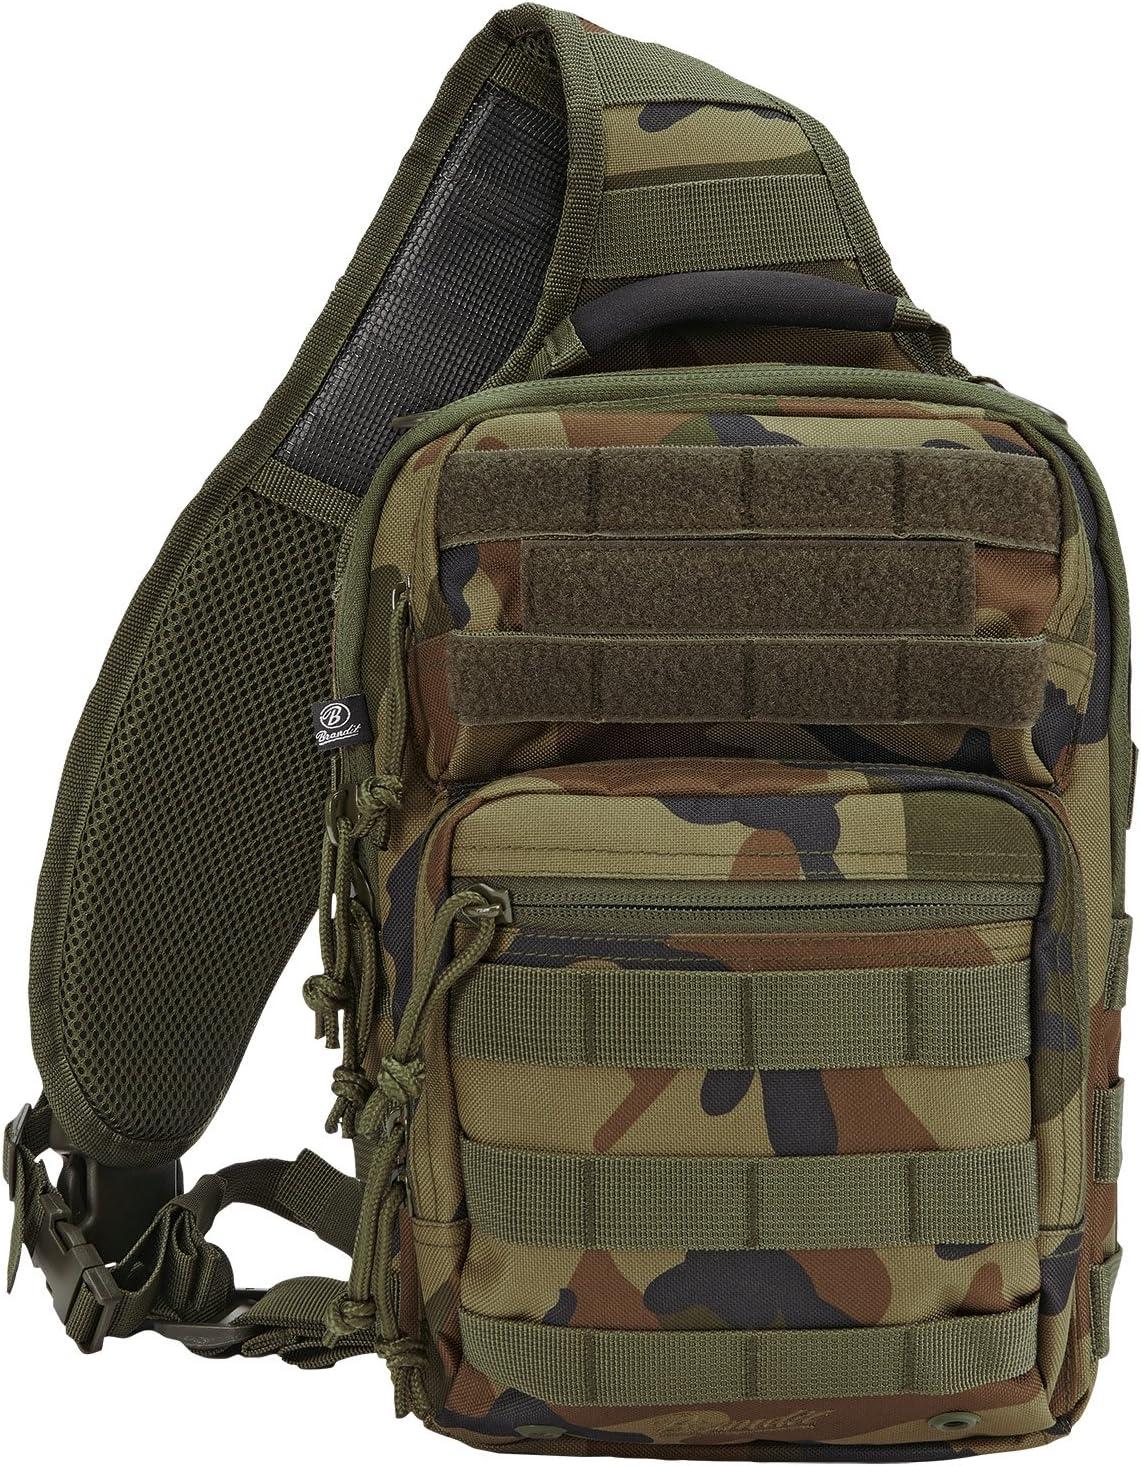 Farbe:Camel Brandit Messenger Bag US Cooper Every Day Carry Sling